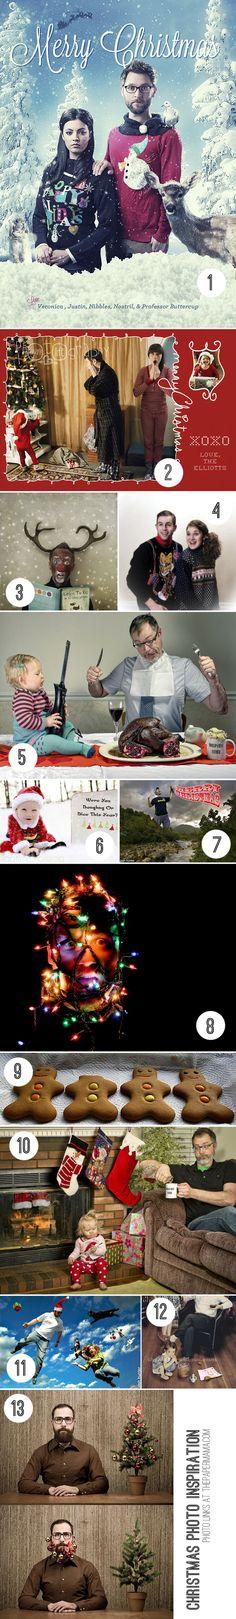 Day 3: Funny Christmas Photo Inspiration